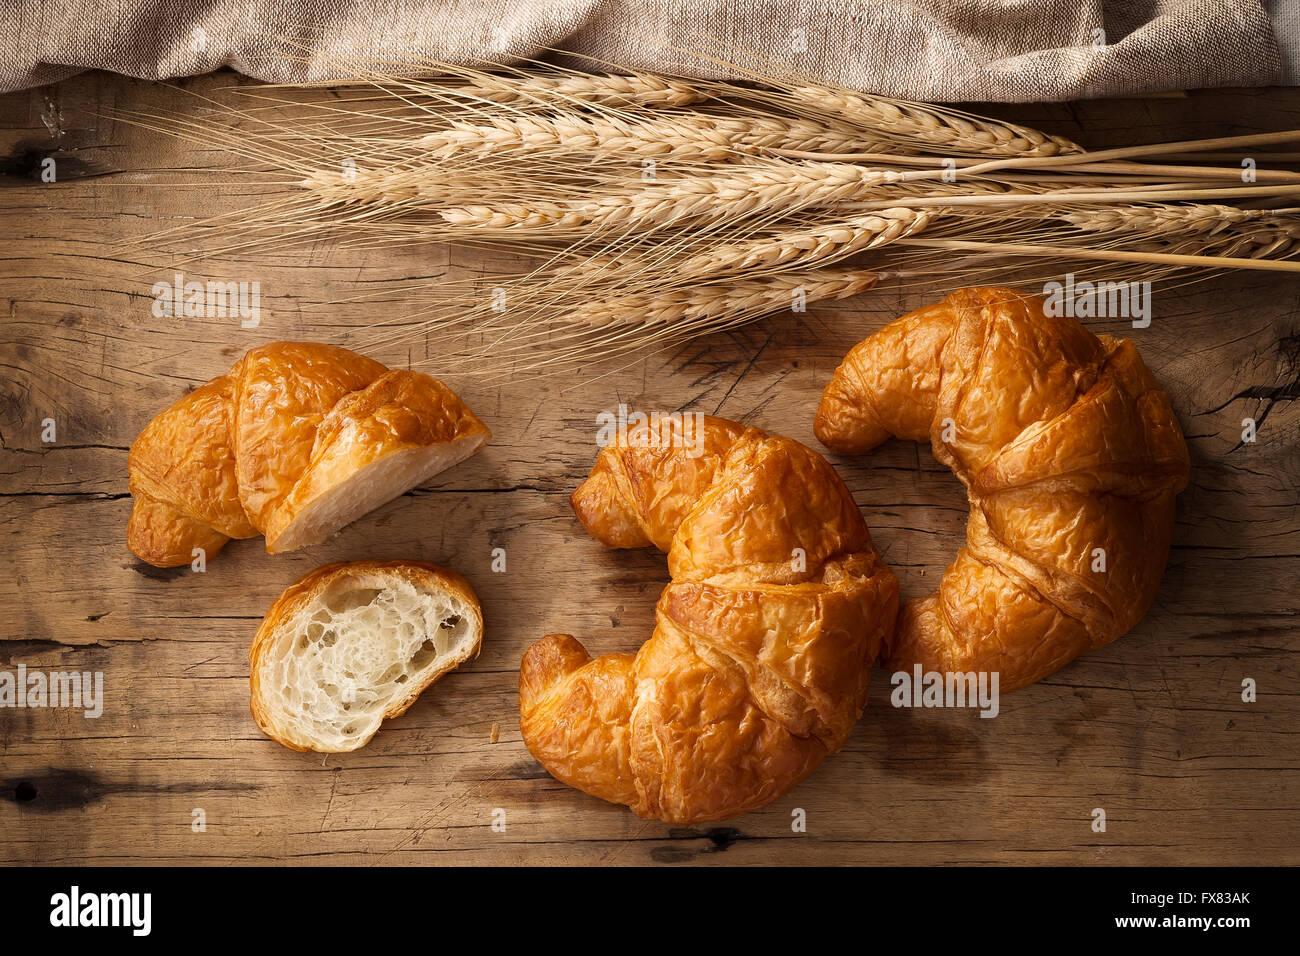 Tasty croissant still life rustic wooden background bakery breakfast brunch - Stock Image